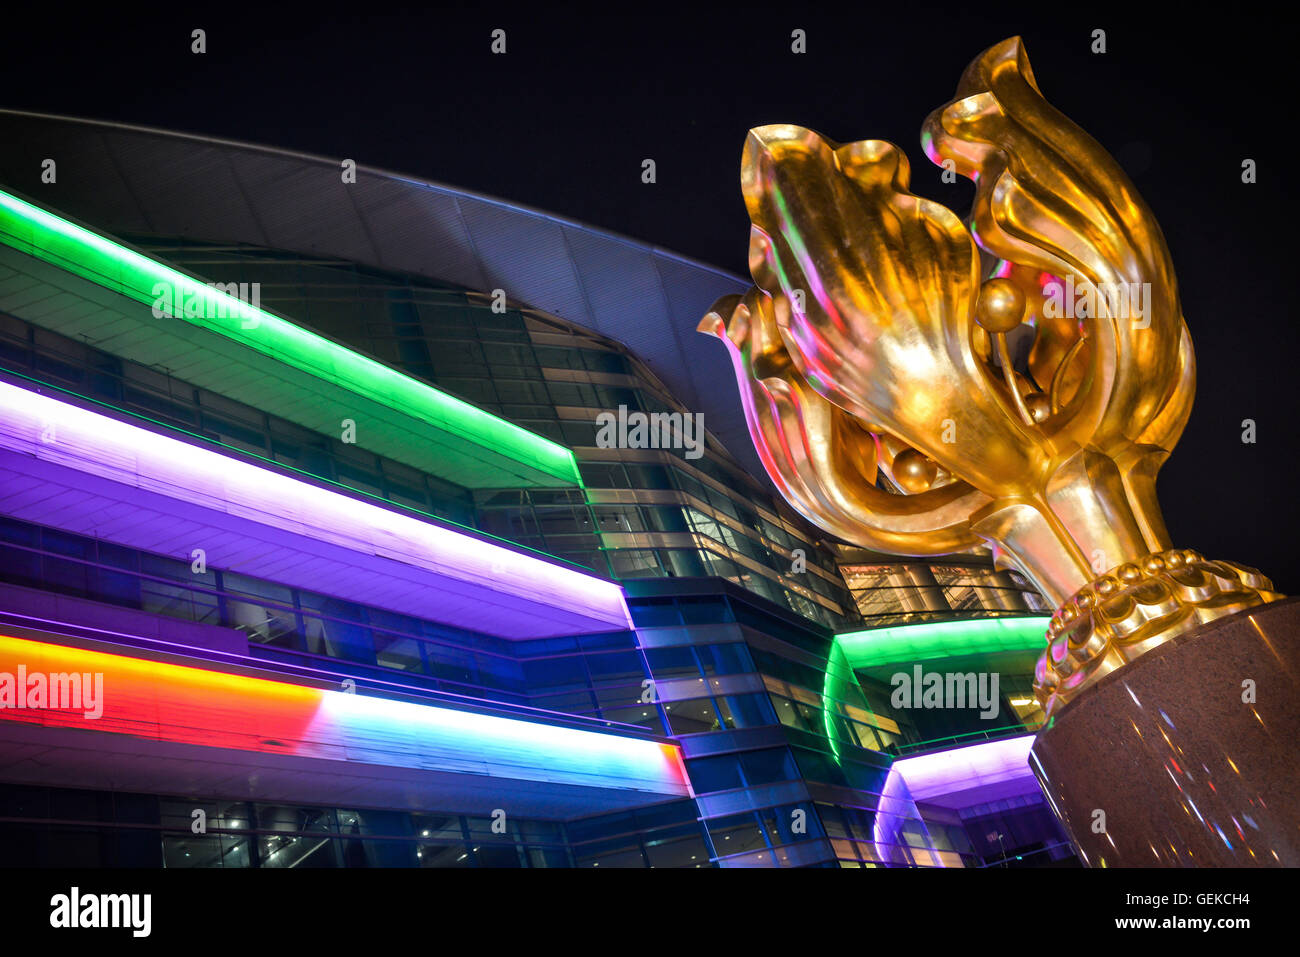 January 30, 2015 - Hong Kong, Hong Kong S.A.R, China - The Forever Blooming Bauhinia Sculpture on Expo Promenade - Stock Image